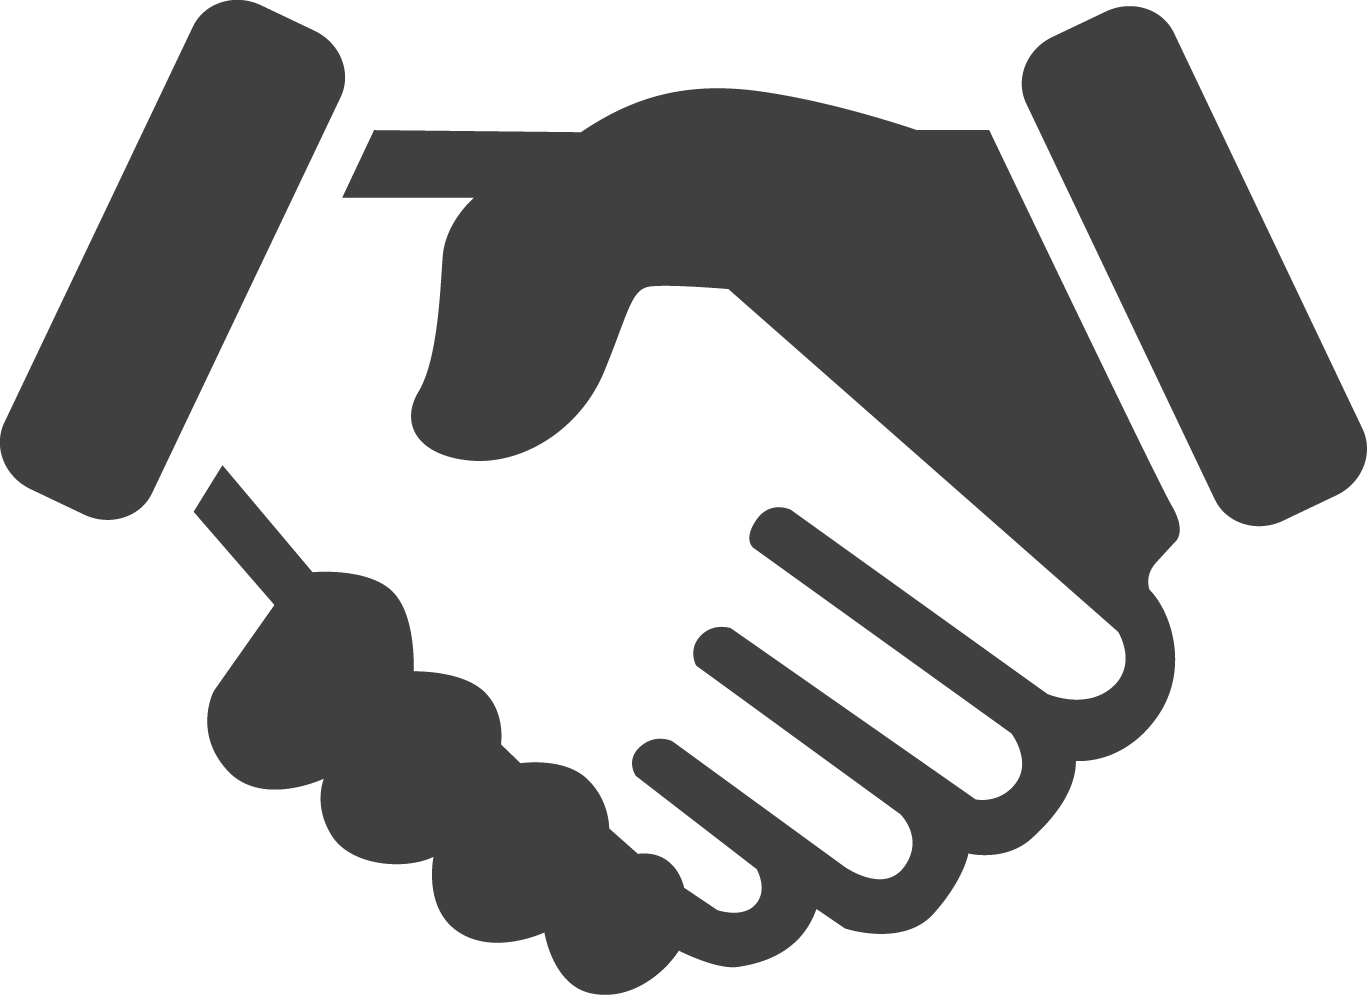 Handshake clipart helping hand. Naito public affairs relationship